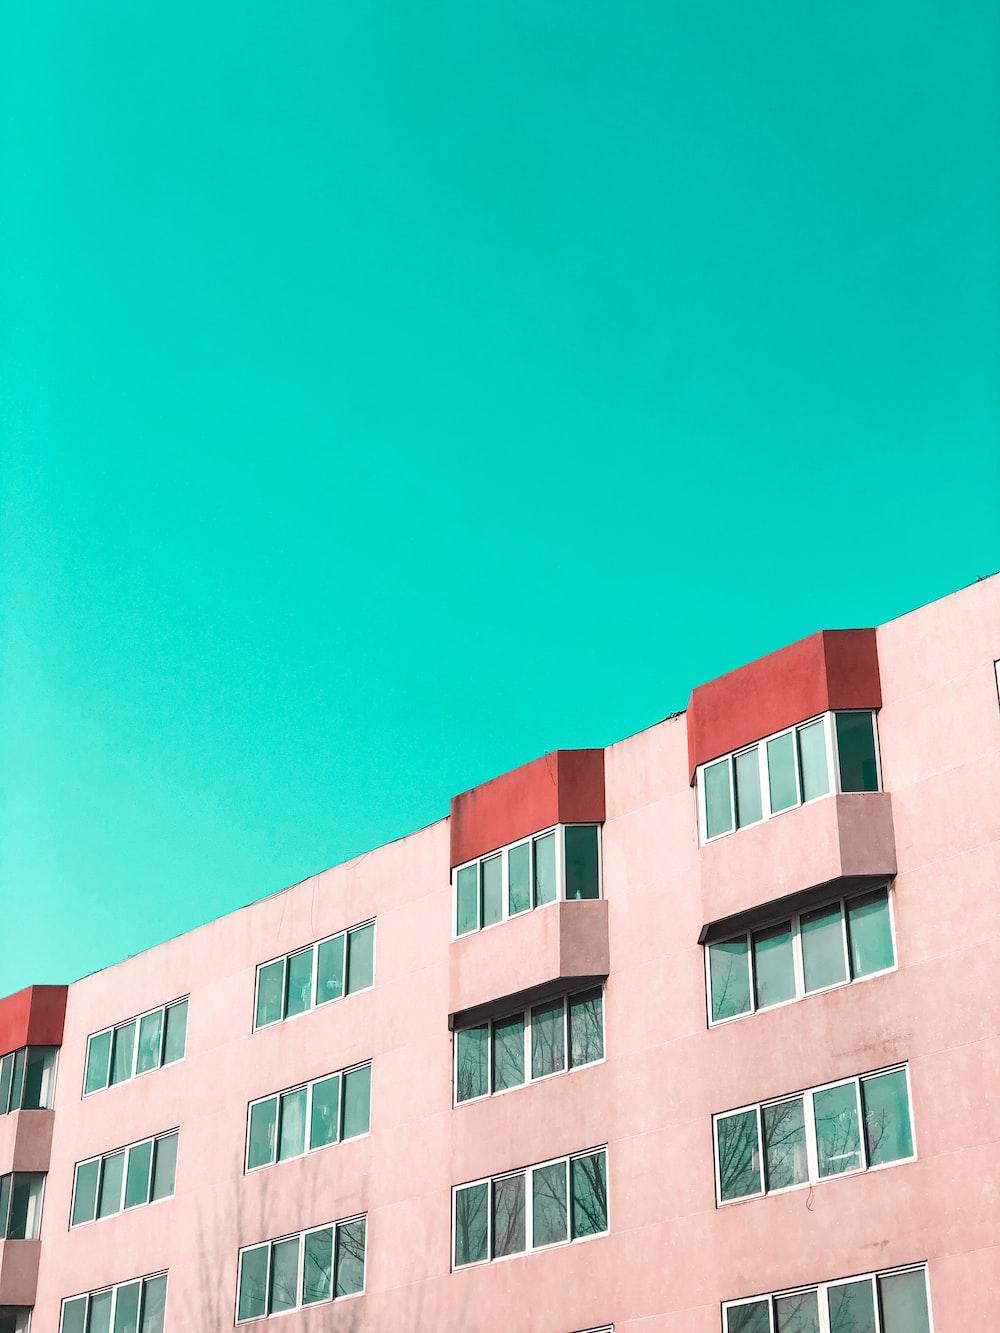 pink concrete building under blue sky during daytime